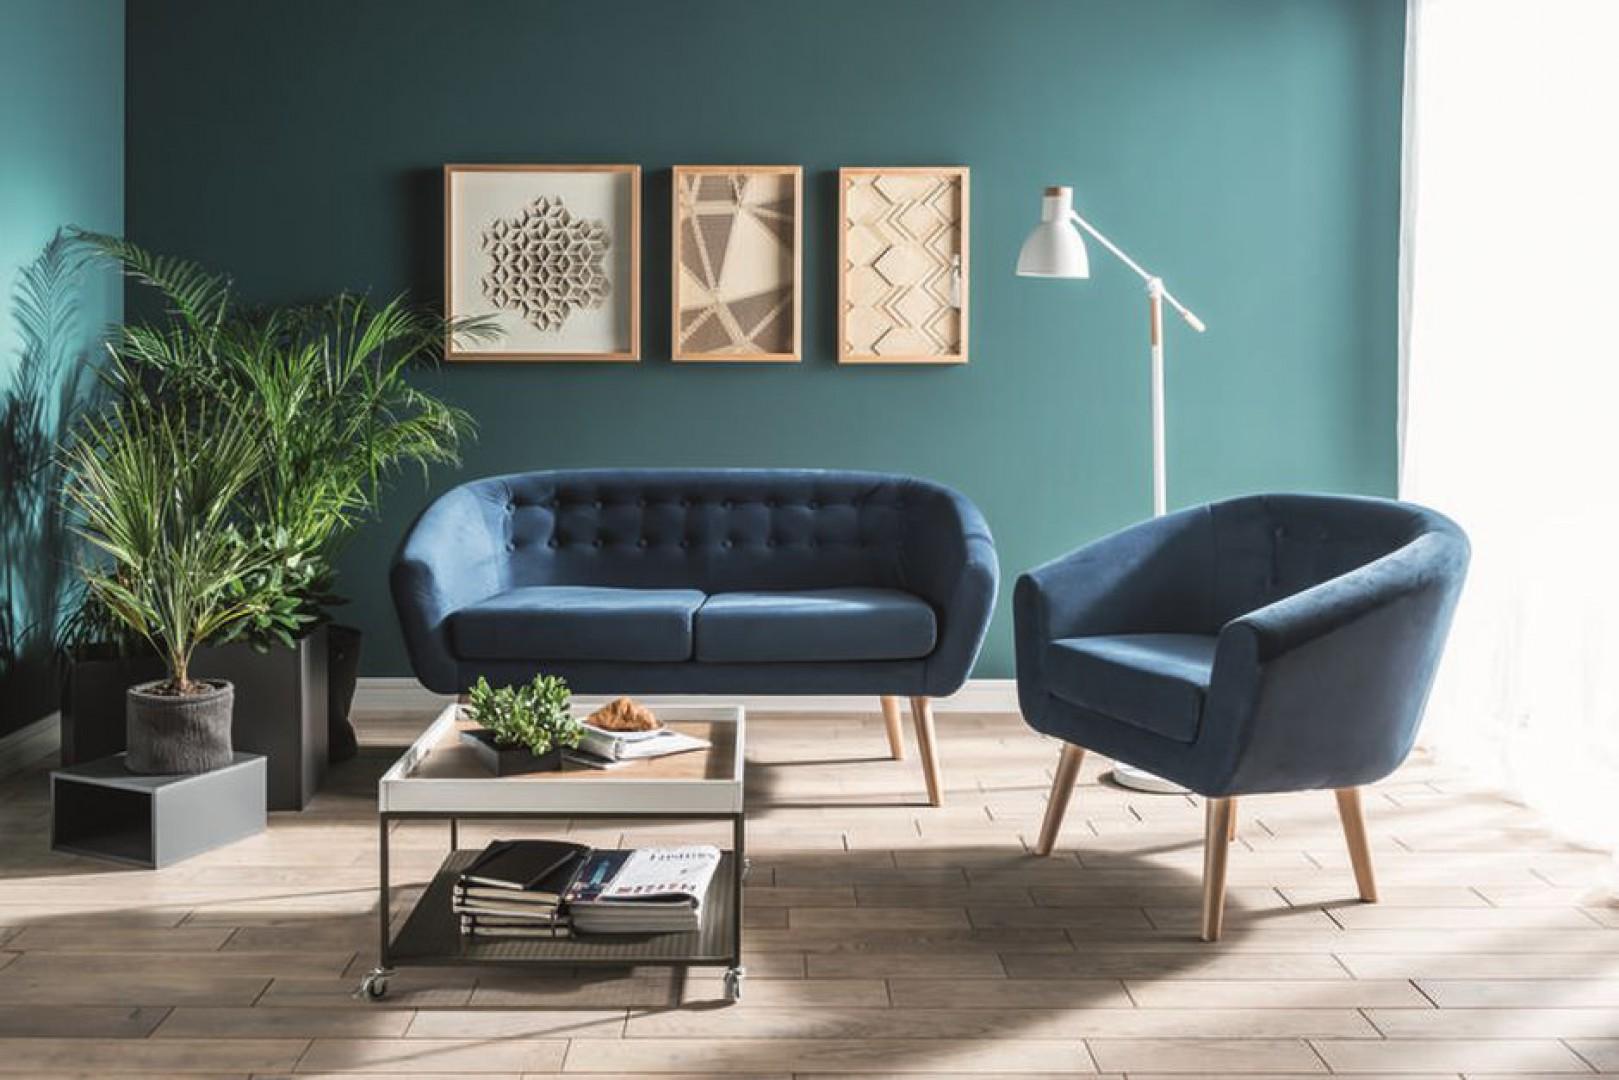 Fotel Alma, cena od 990 zł, Vox